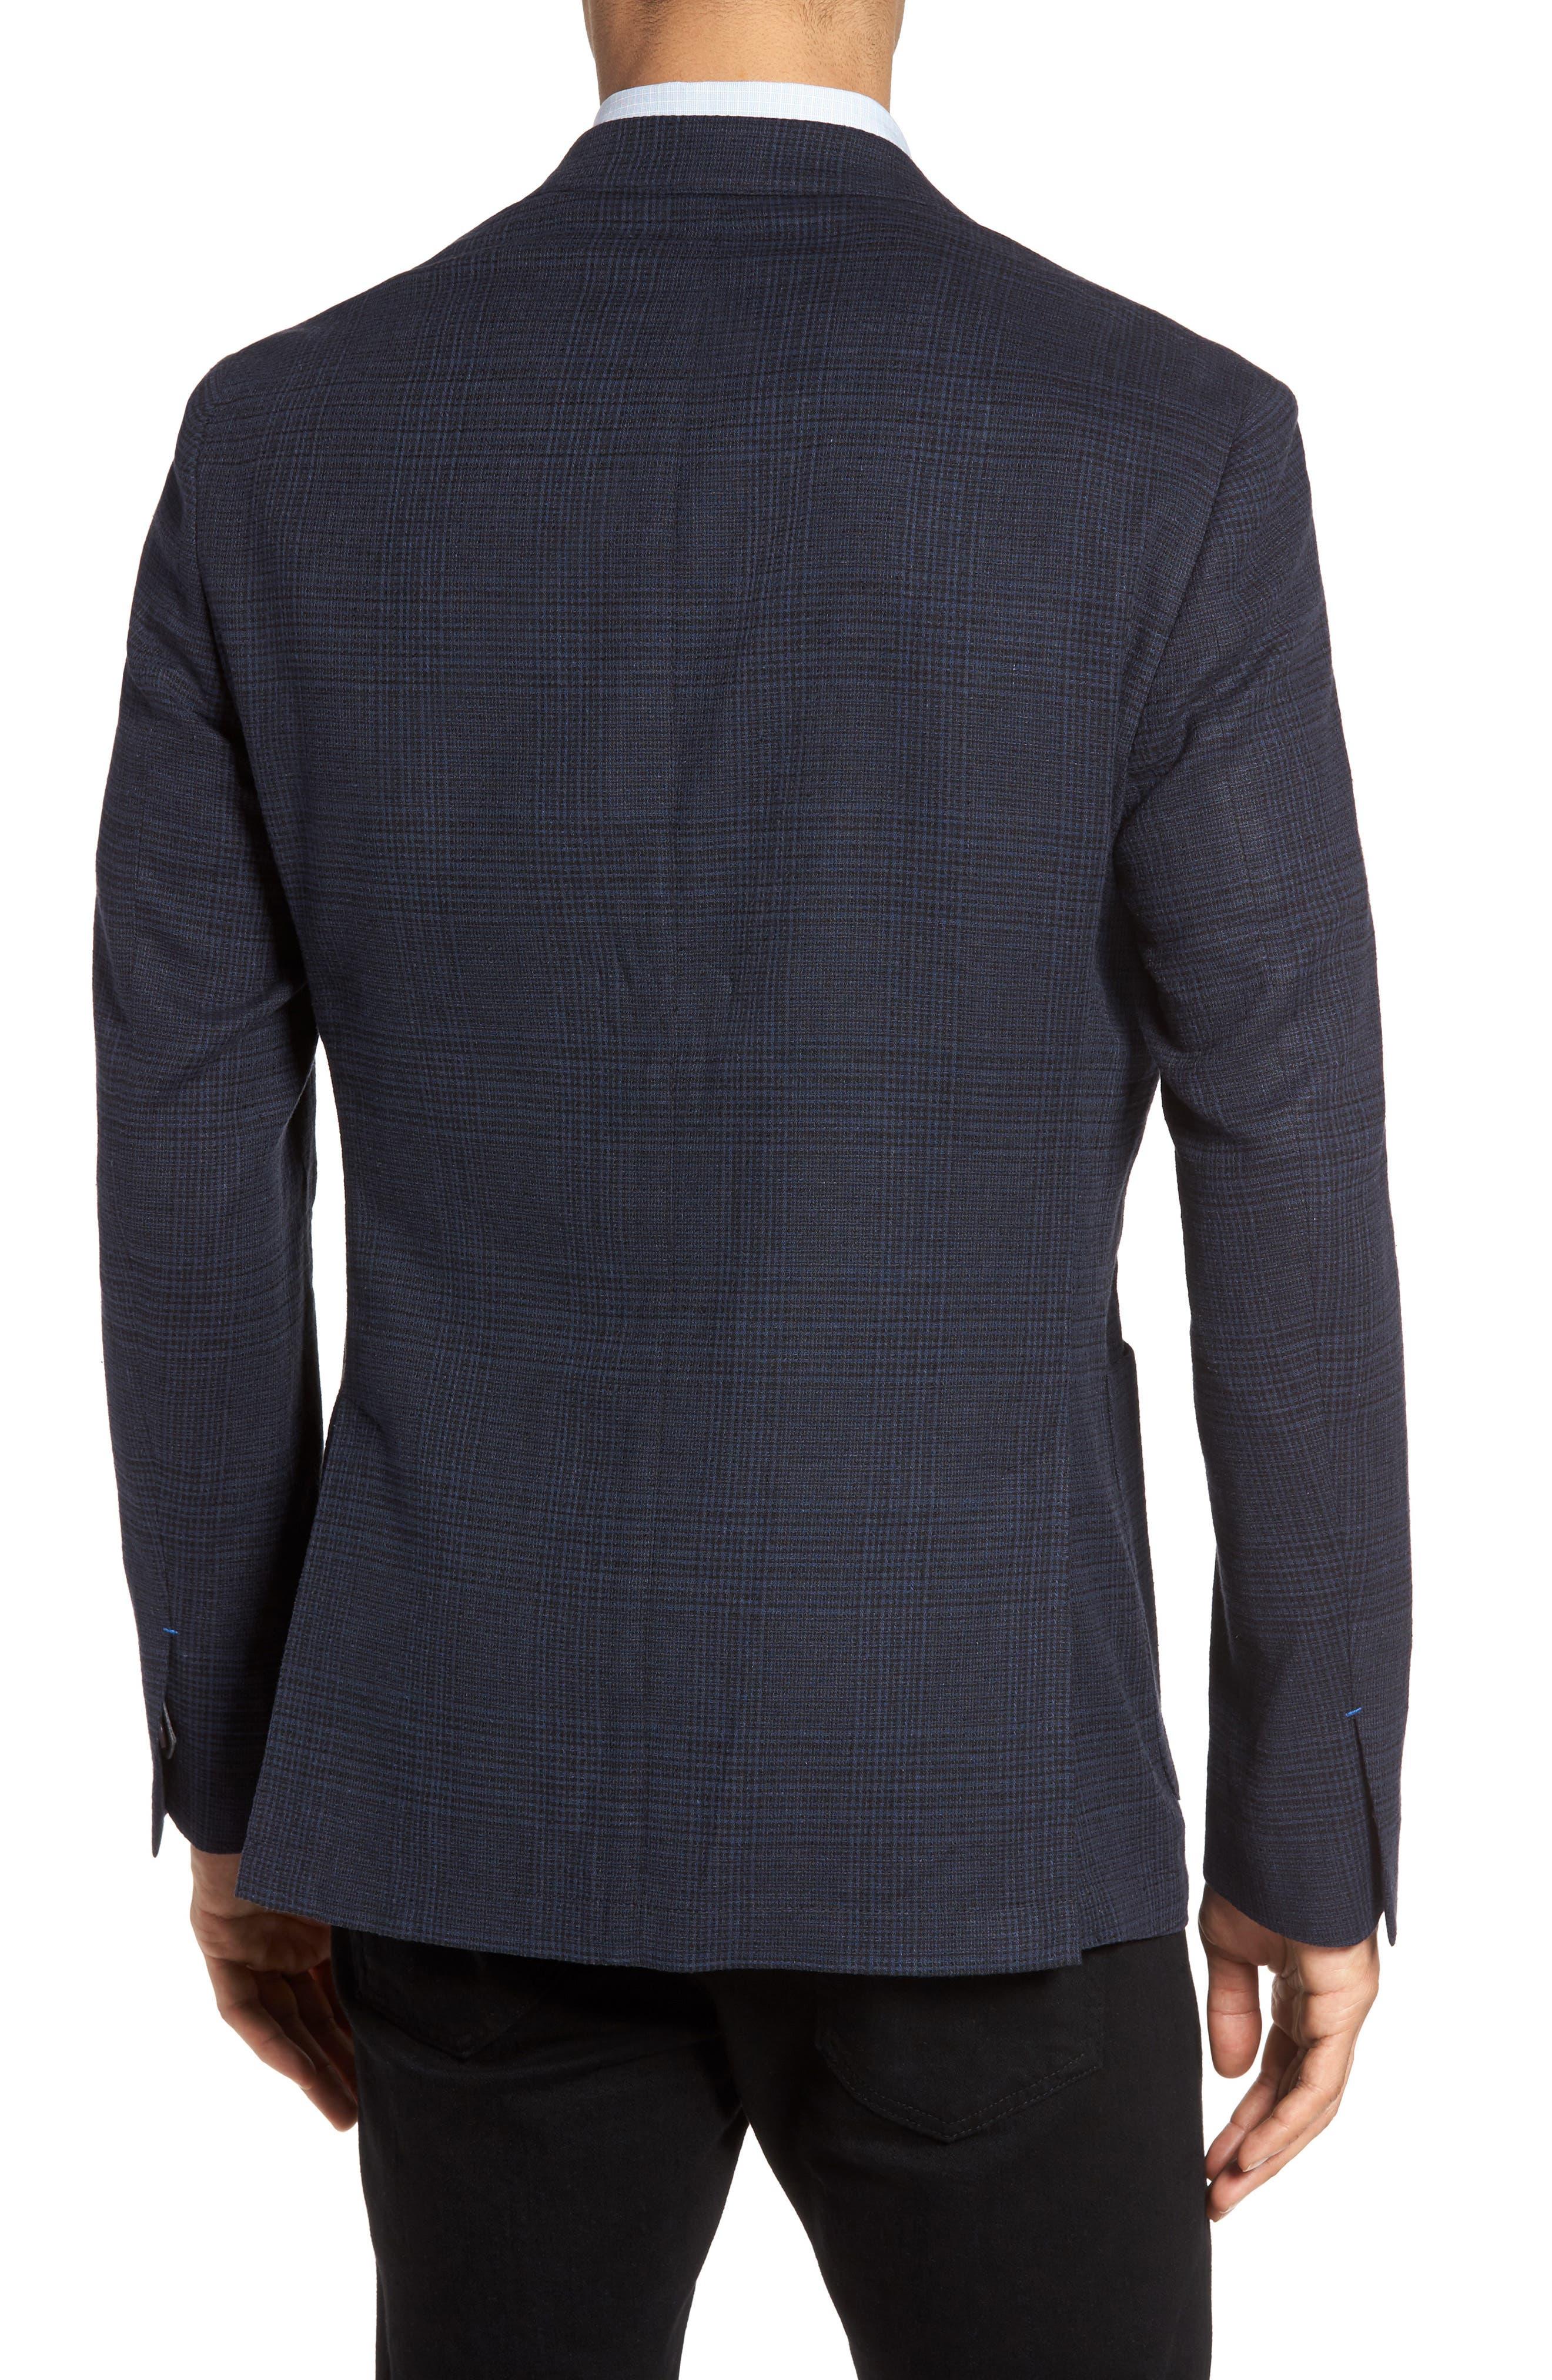 Delaria Plaid Wool Blend Jacket,                             Alternate thumbnail 4, color,